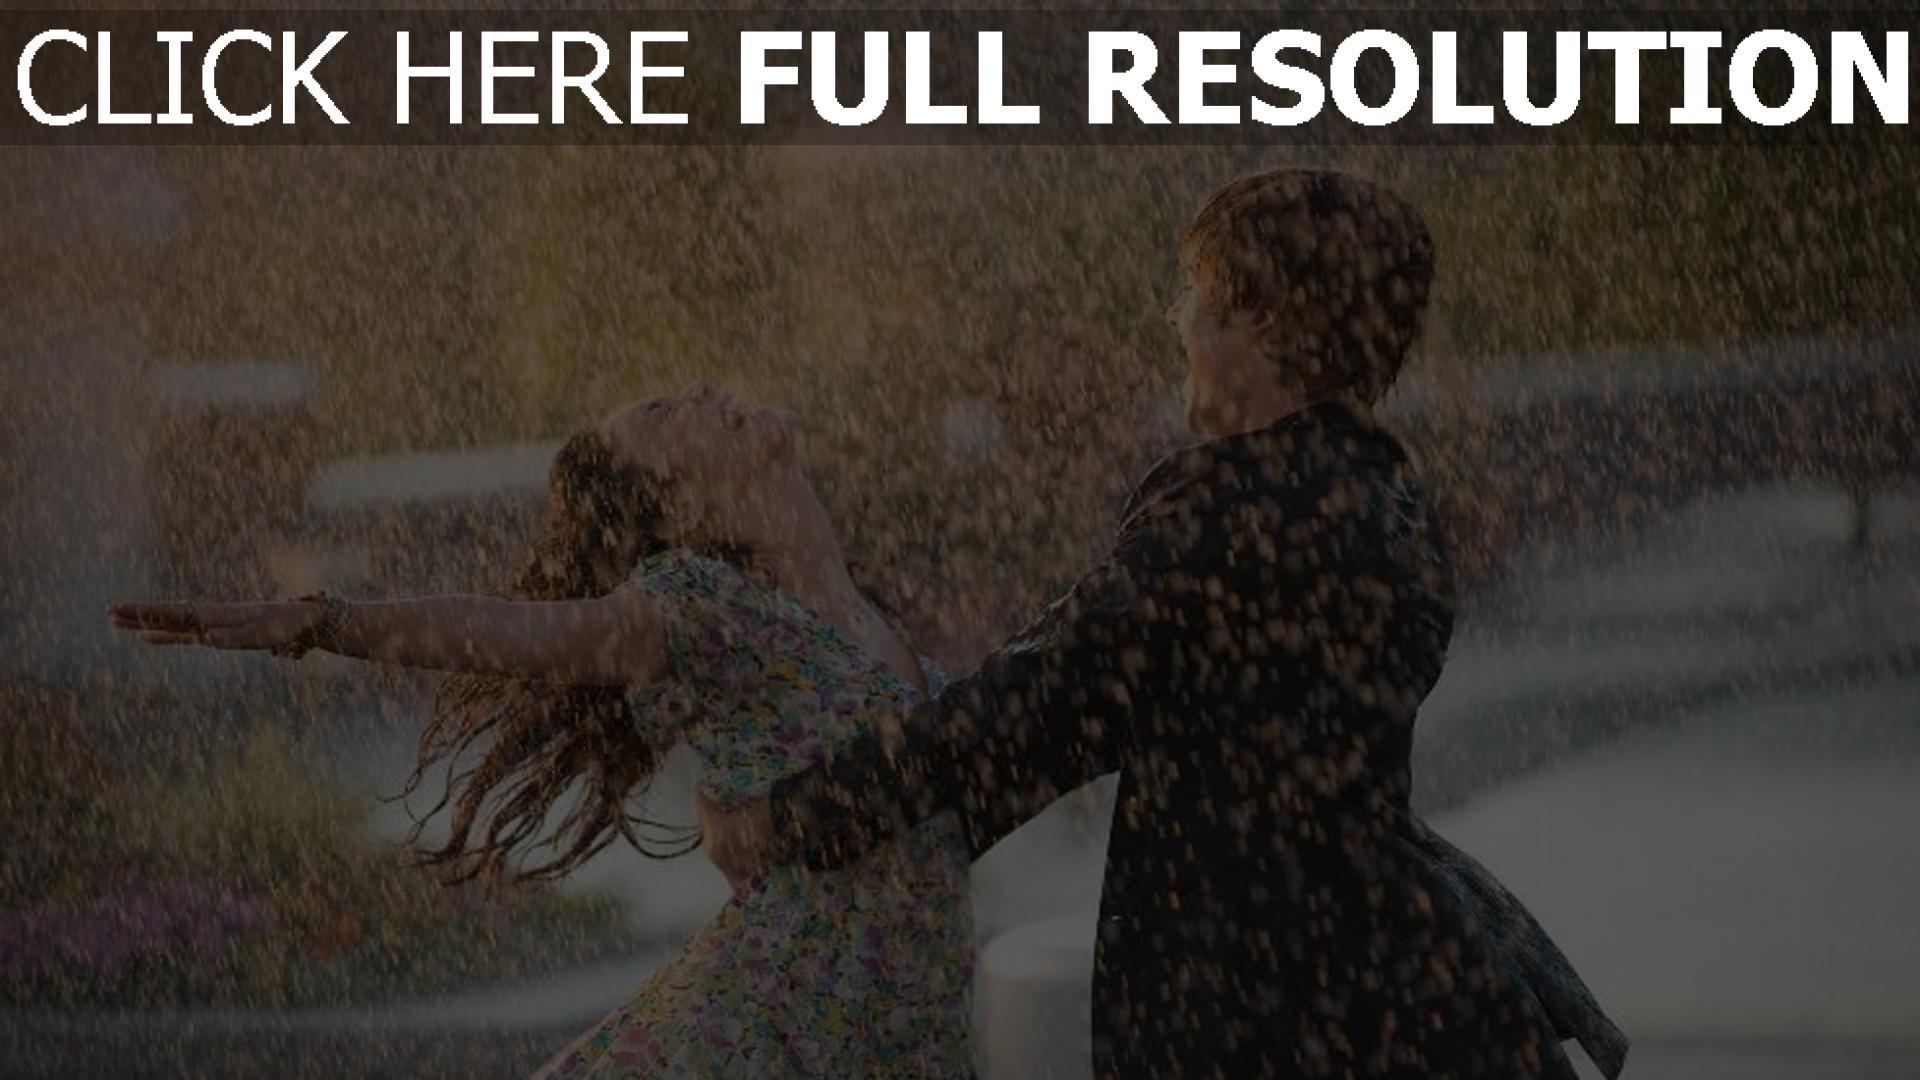 hd hintergrundbilder regen tropfen paar tanz freude romantik 1920x1080